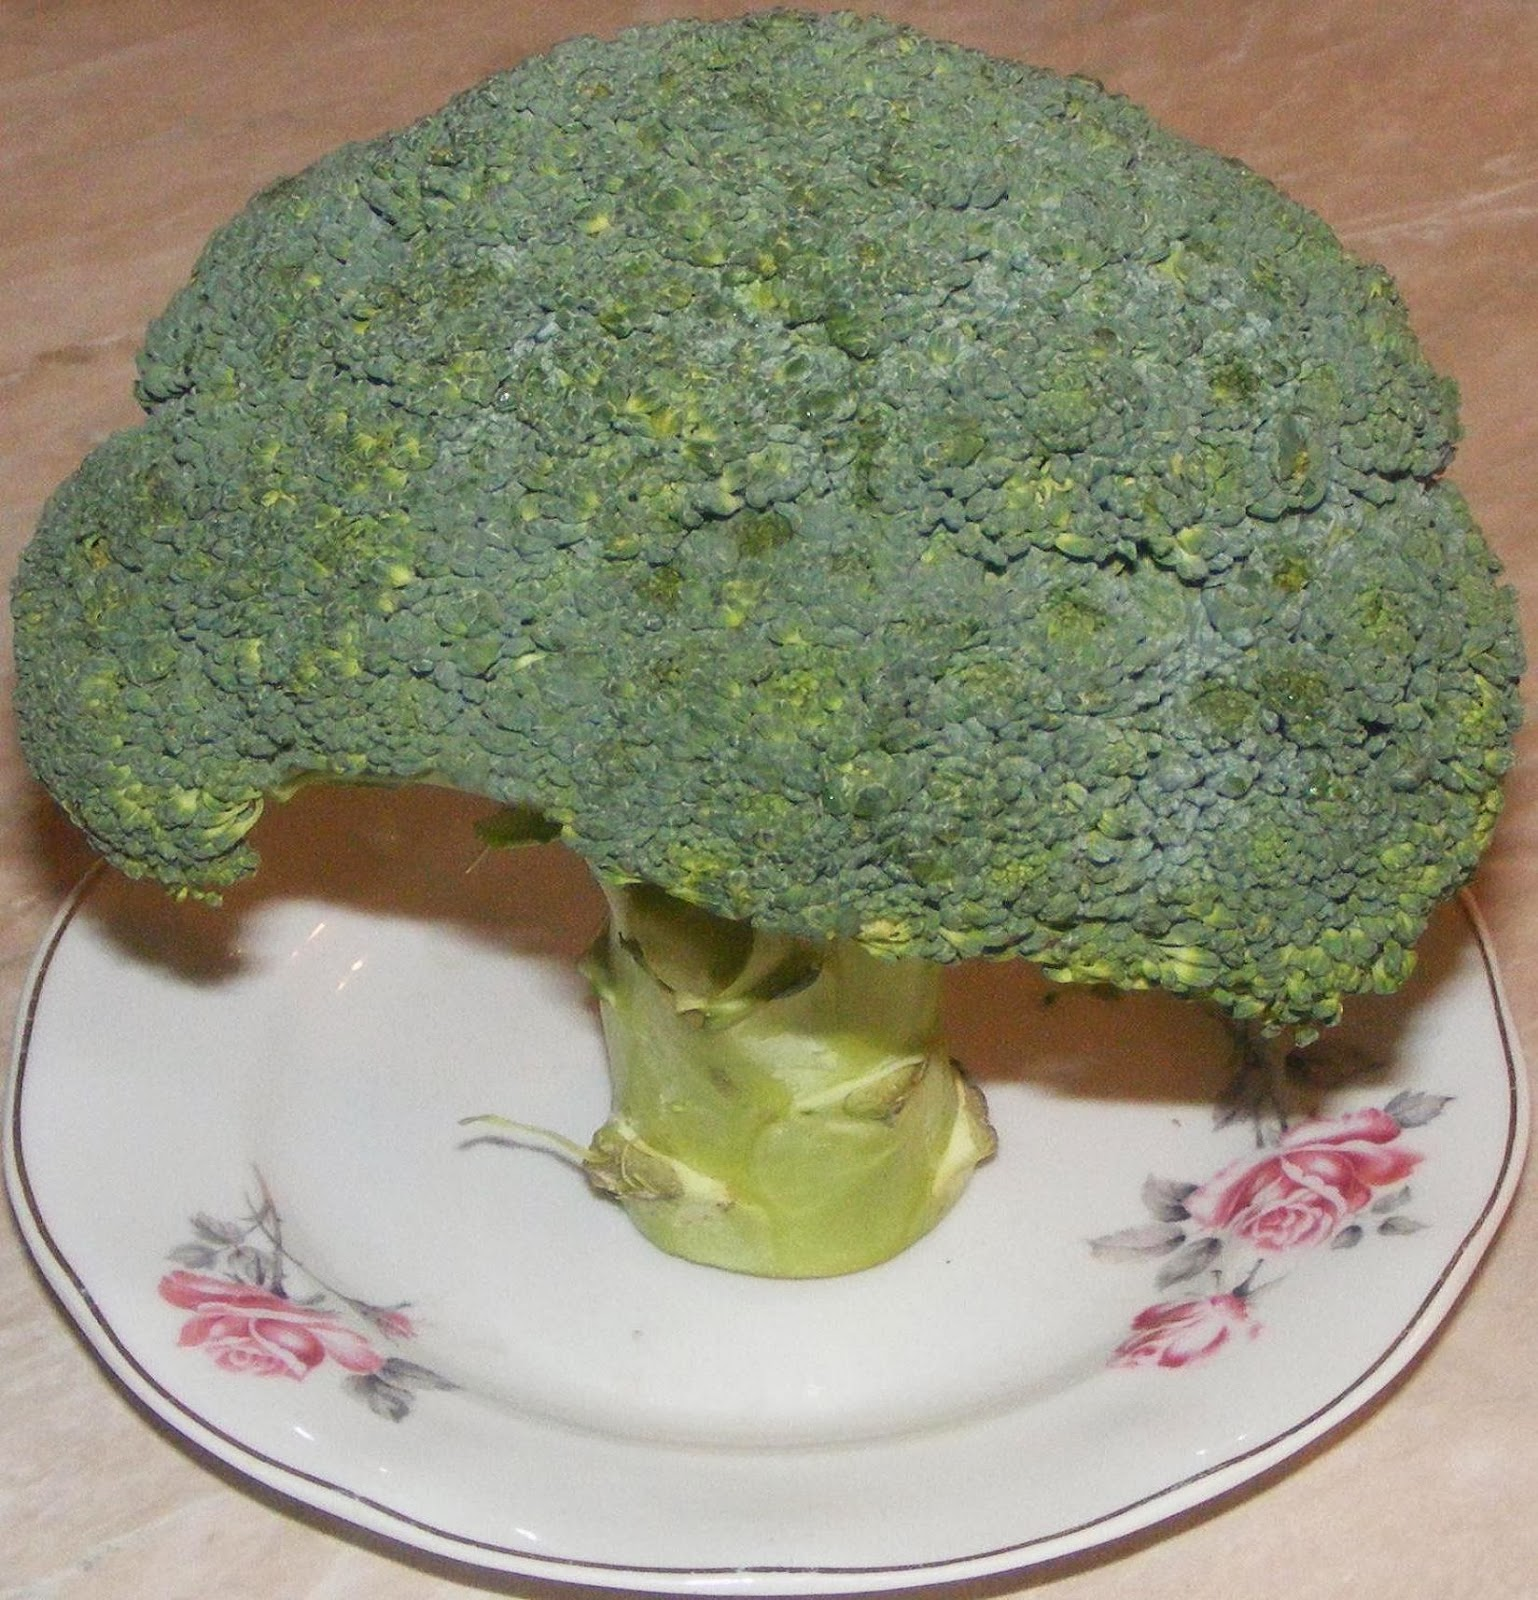 broccoli, retete cu broccoli, preparate cu broccoli, pui cu broccoli, diete de slabire, cure de slabire, cura de slabire, retete dietetice, retete rapide,